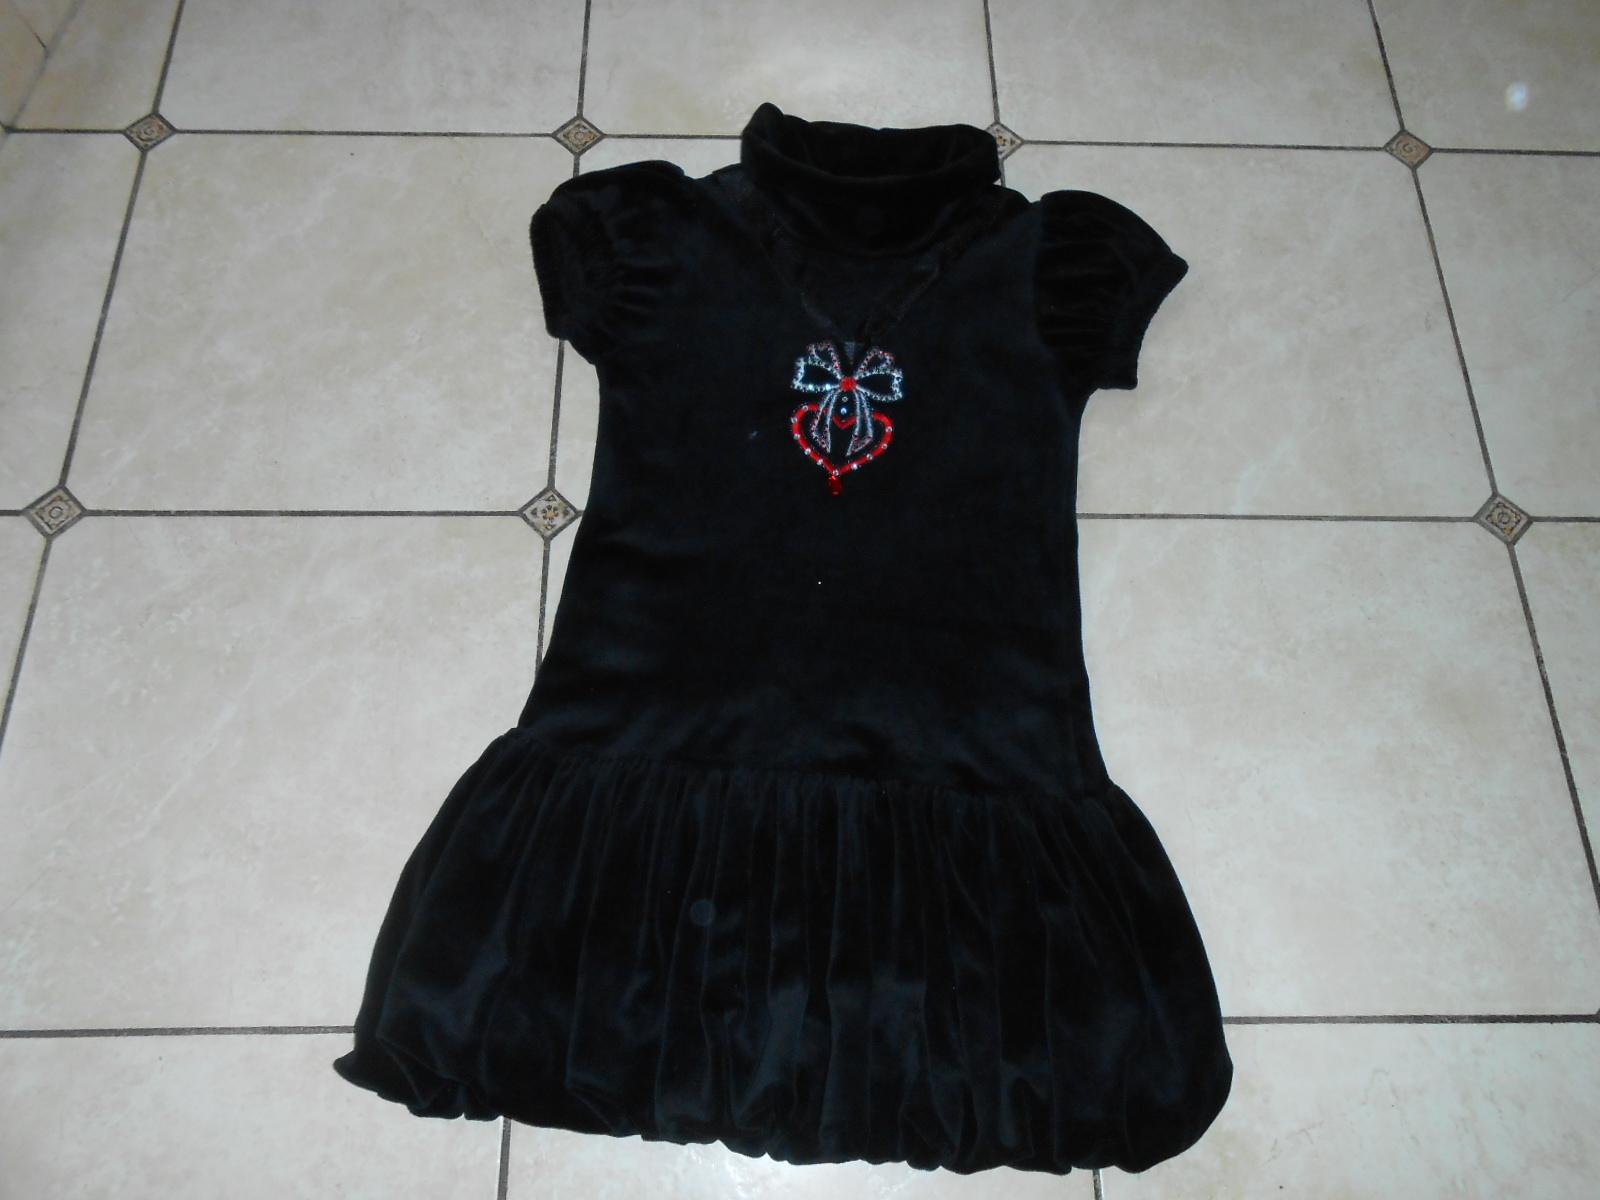 b3a36a40 Wójcik sukienka 146 szkoła